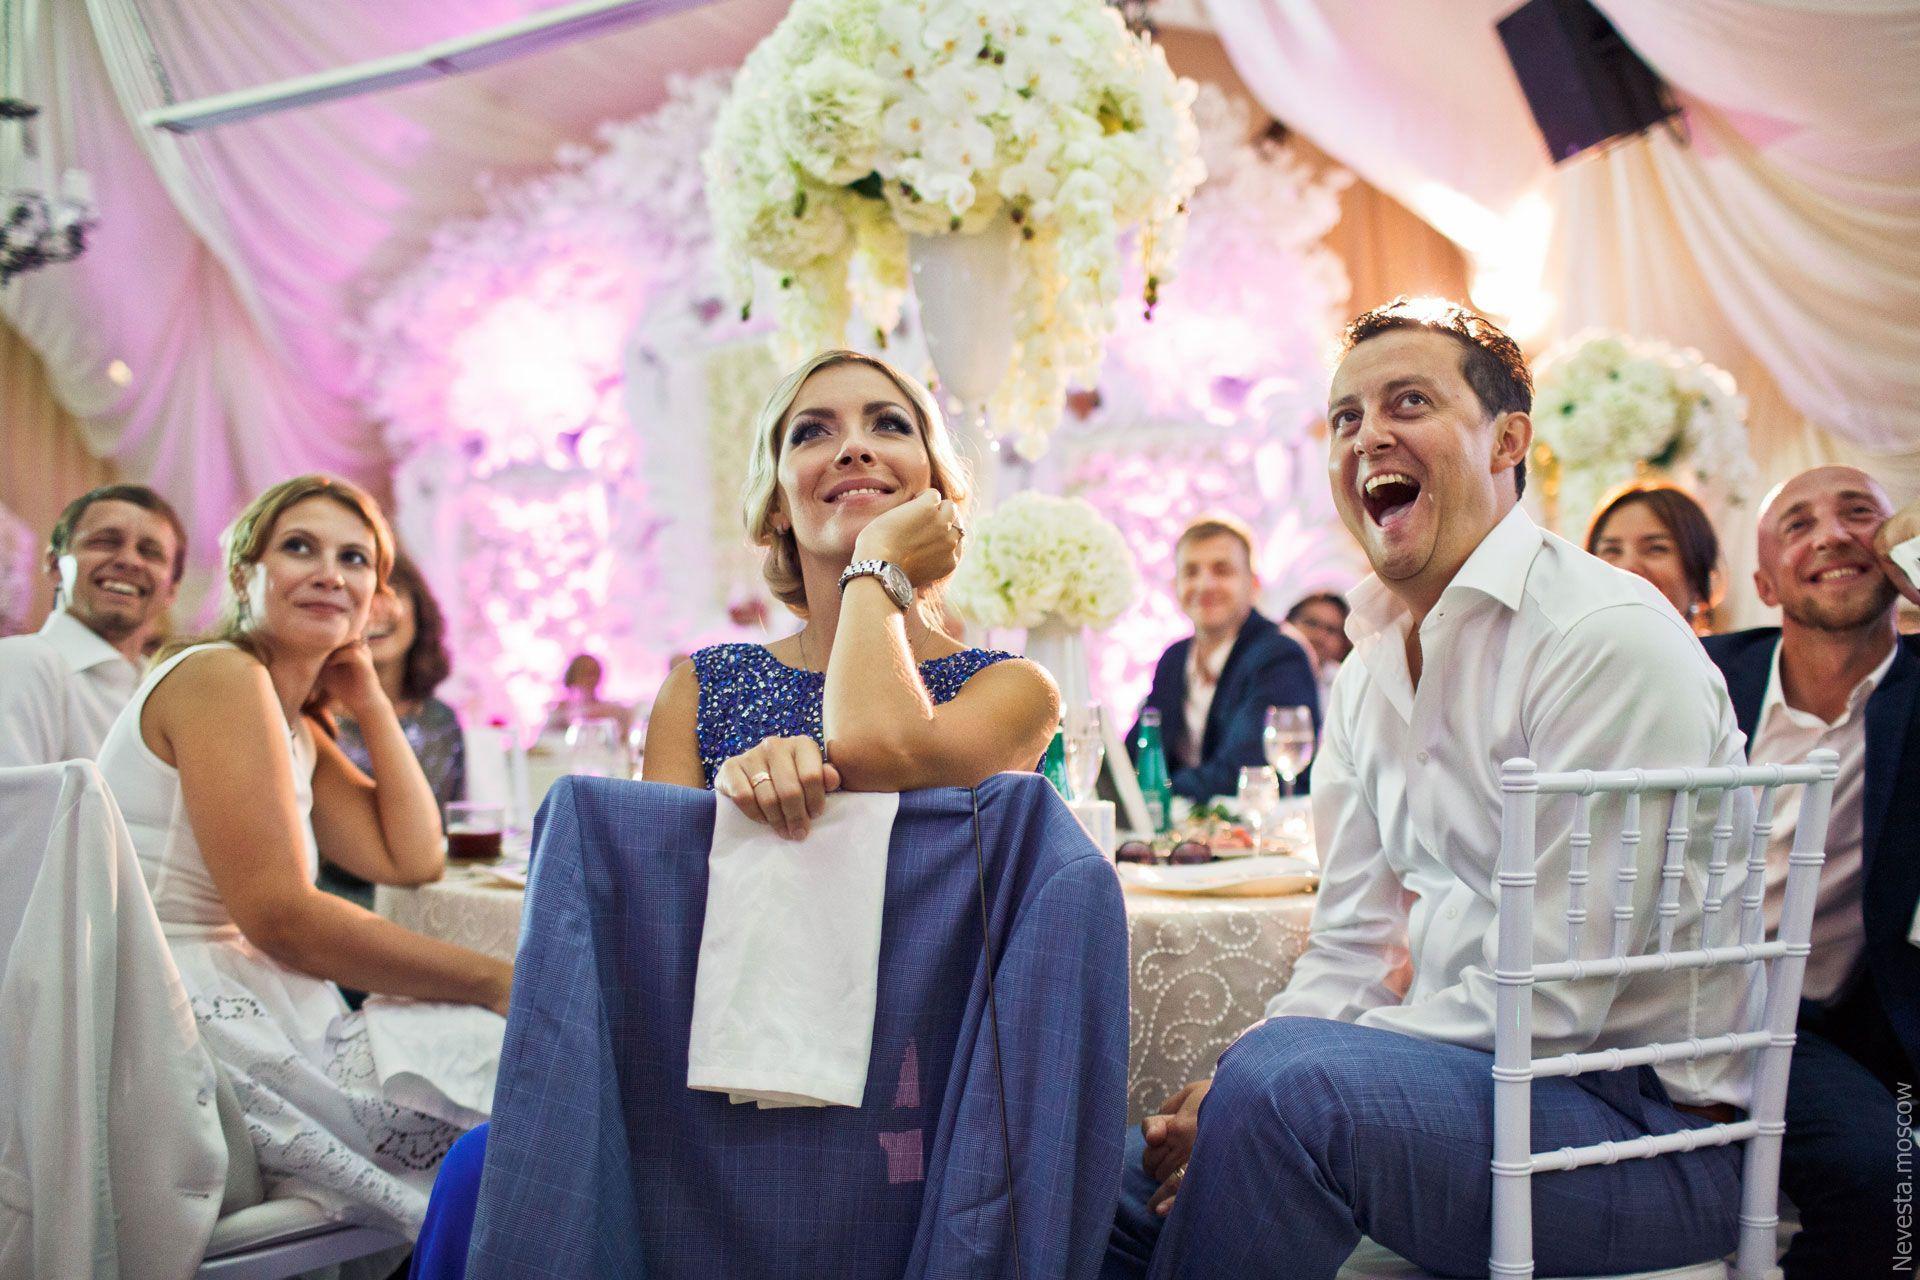 Свадьба Анны Хилькевич и Артура Волкова, фото 12